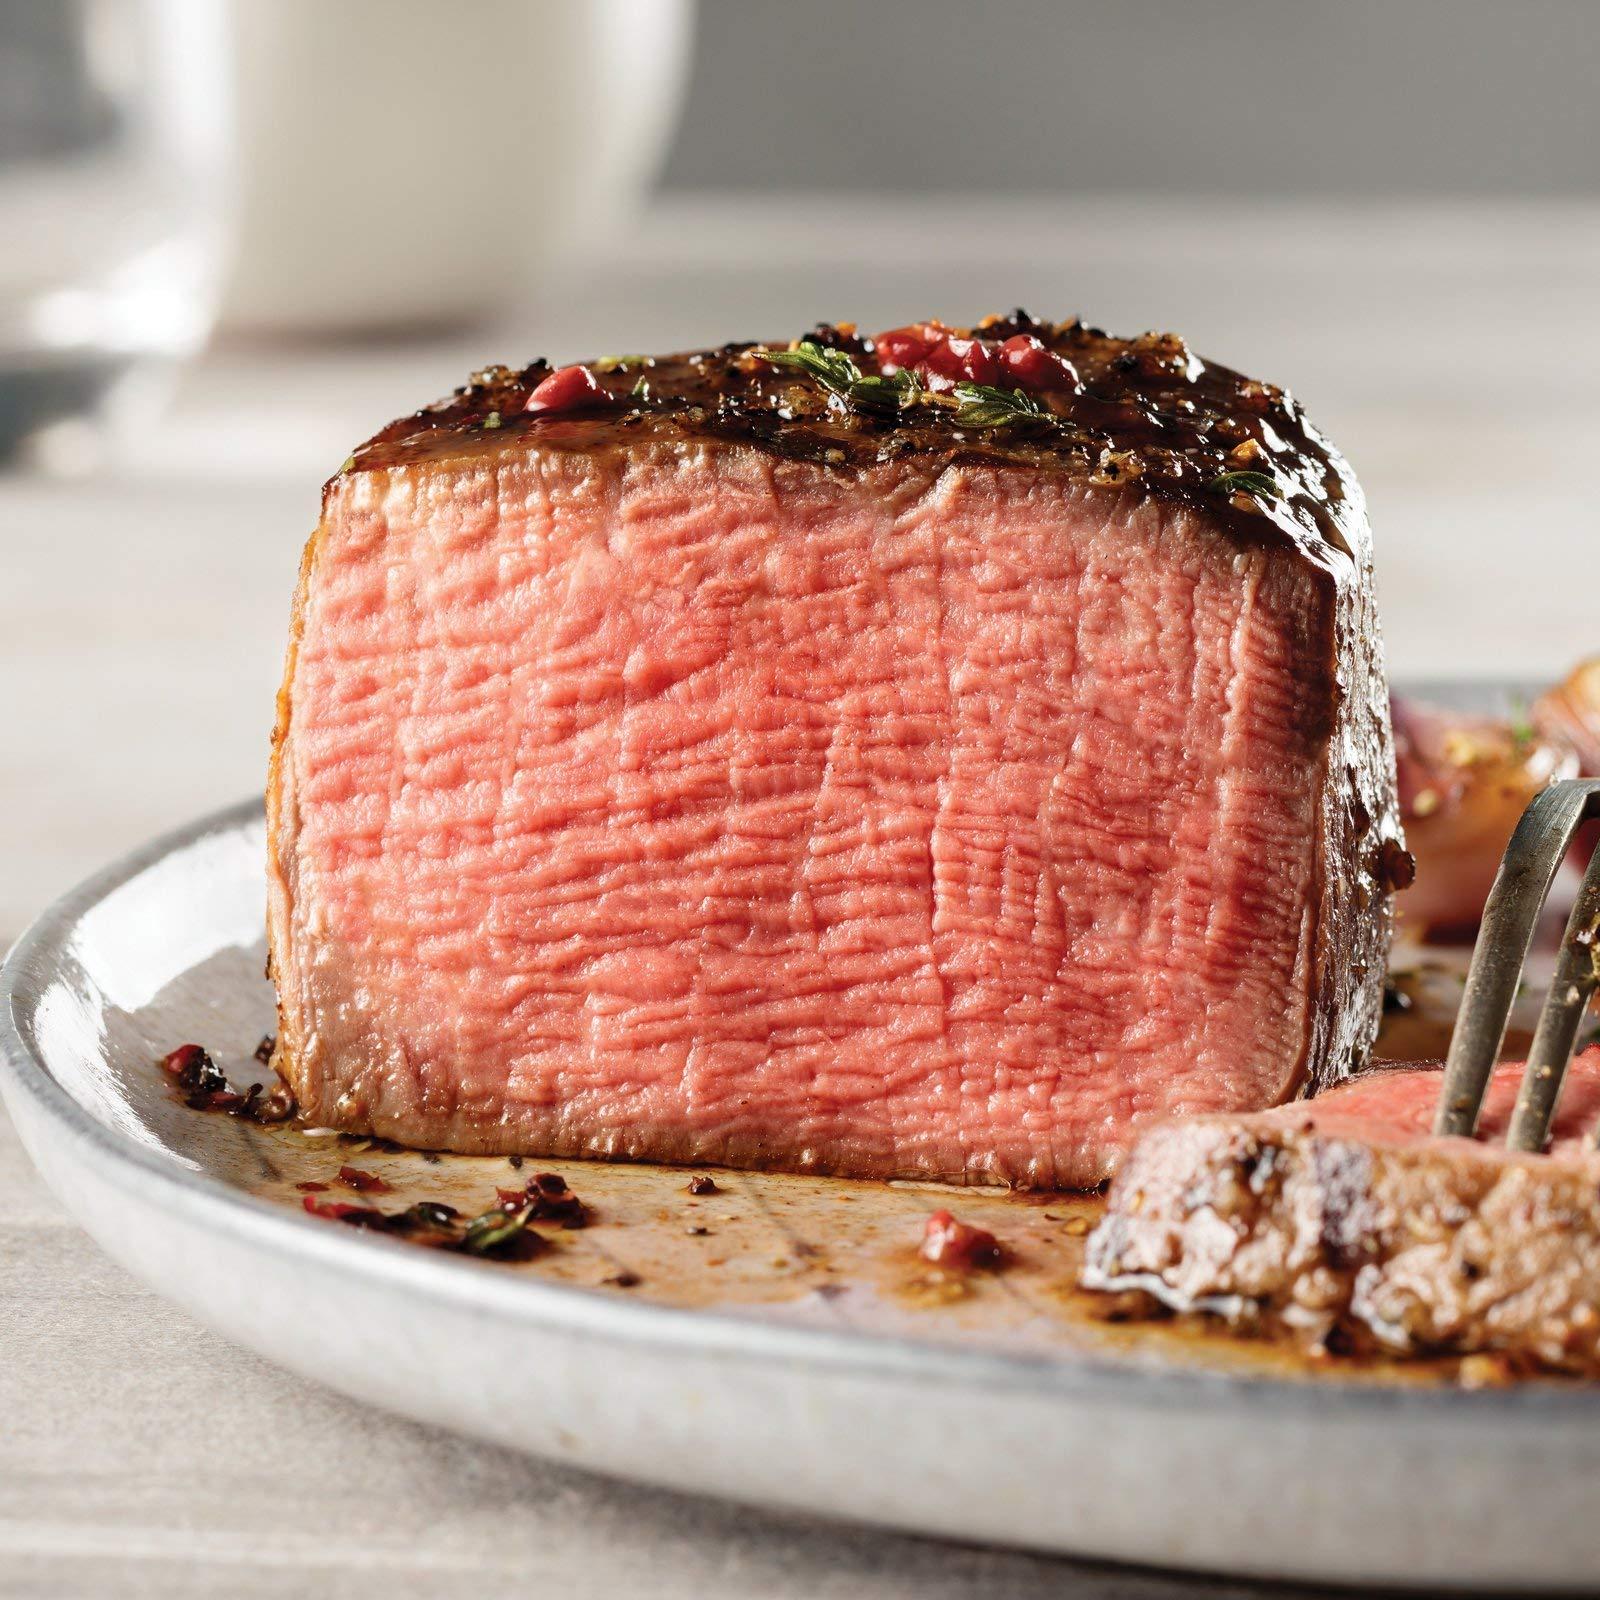 Omaha Steaks 4 (4 oz.) Triple-Trimmed Filet Mignons